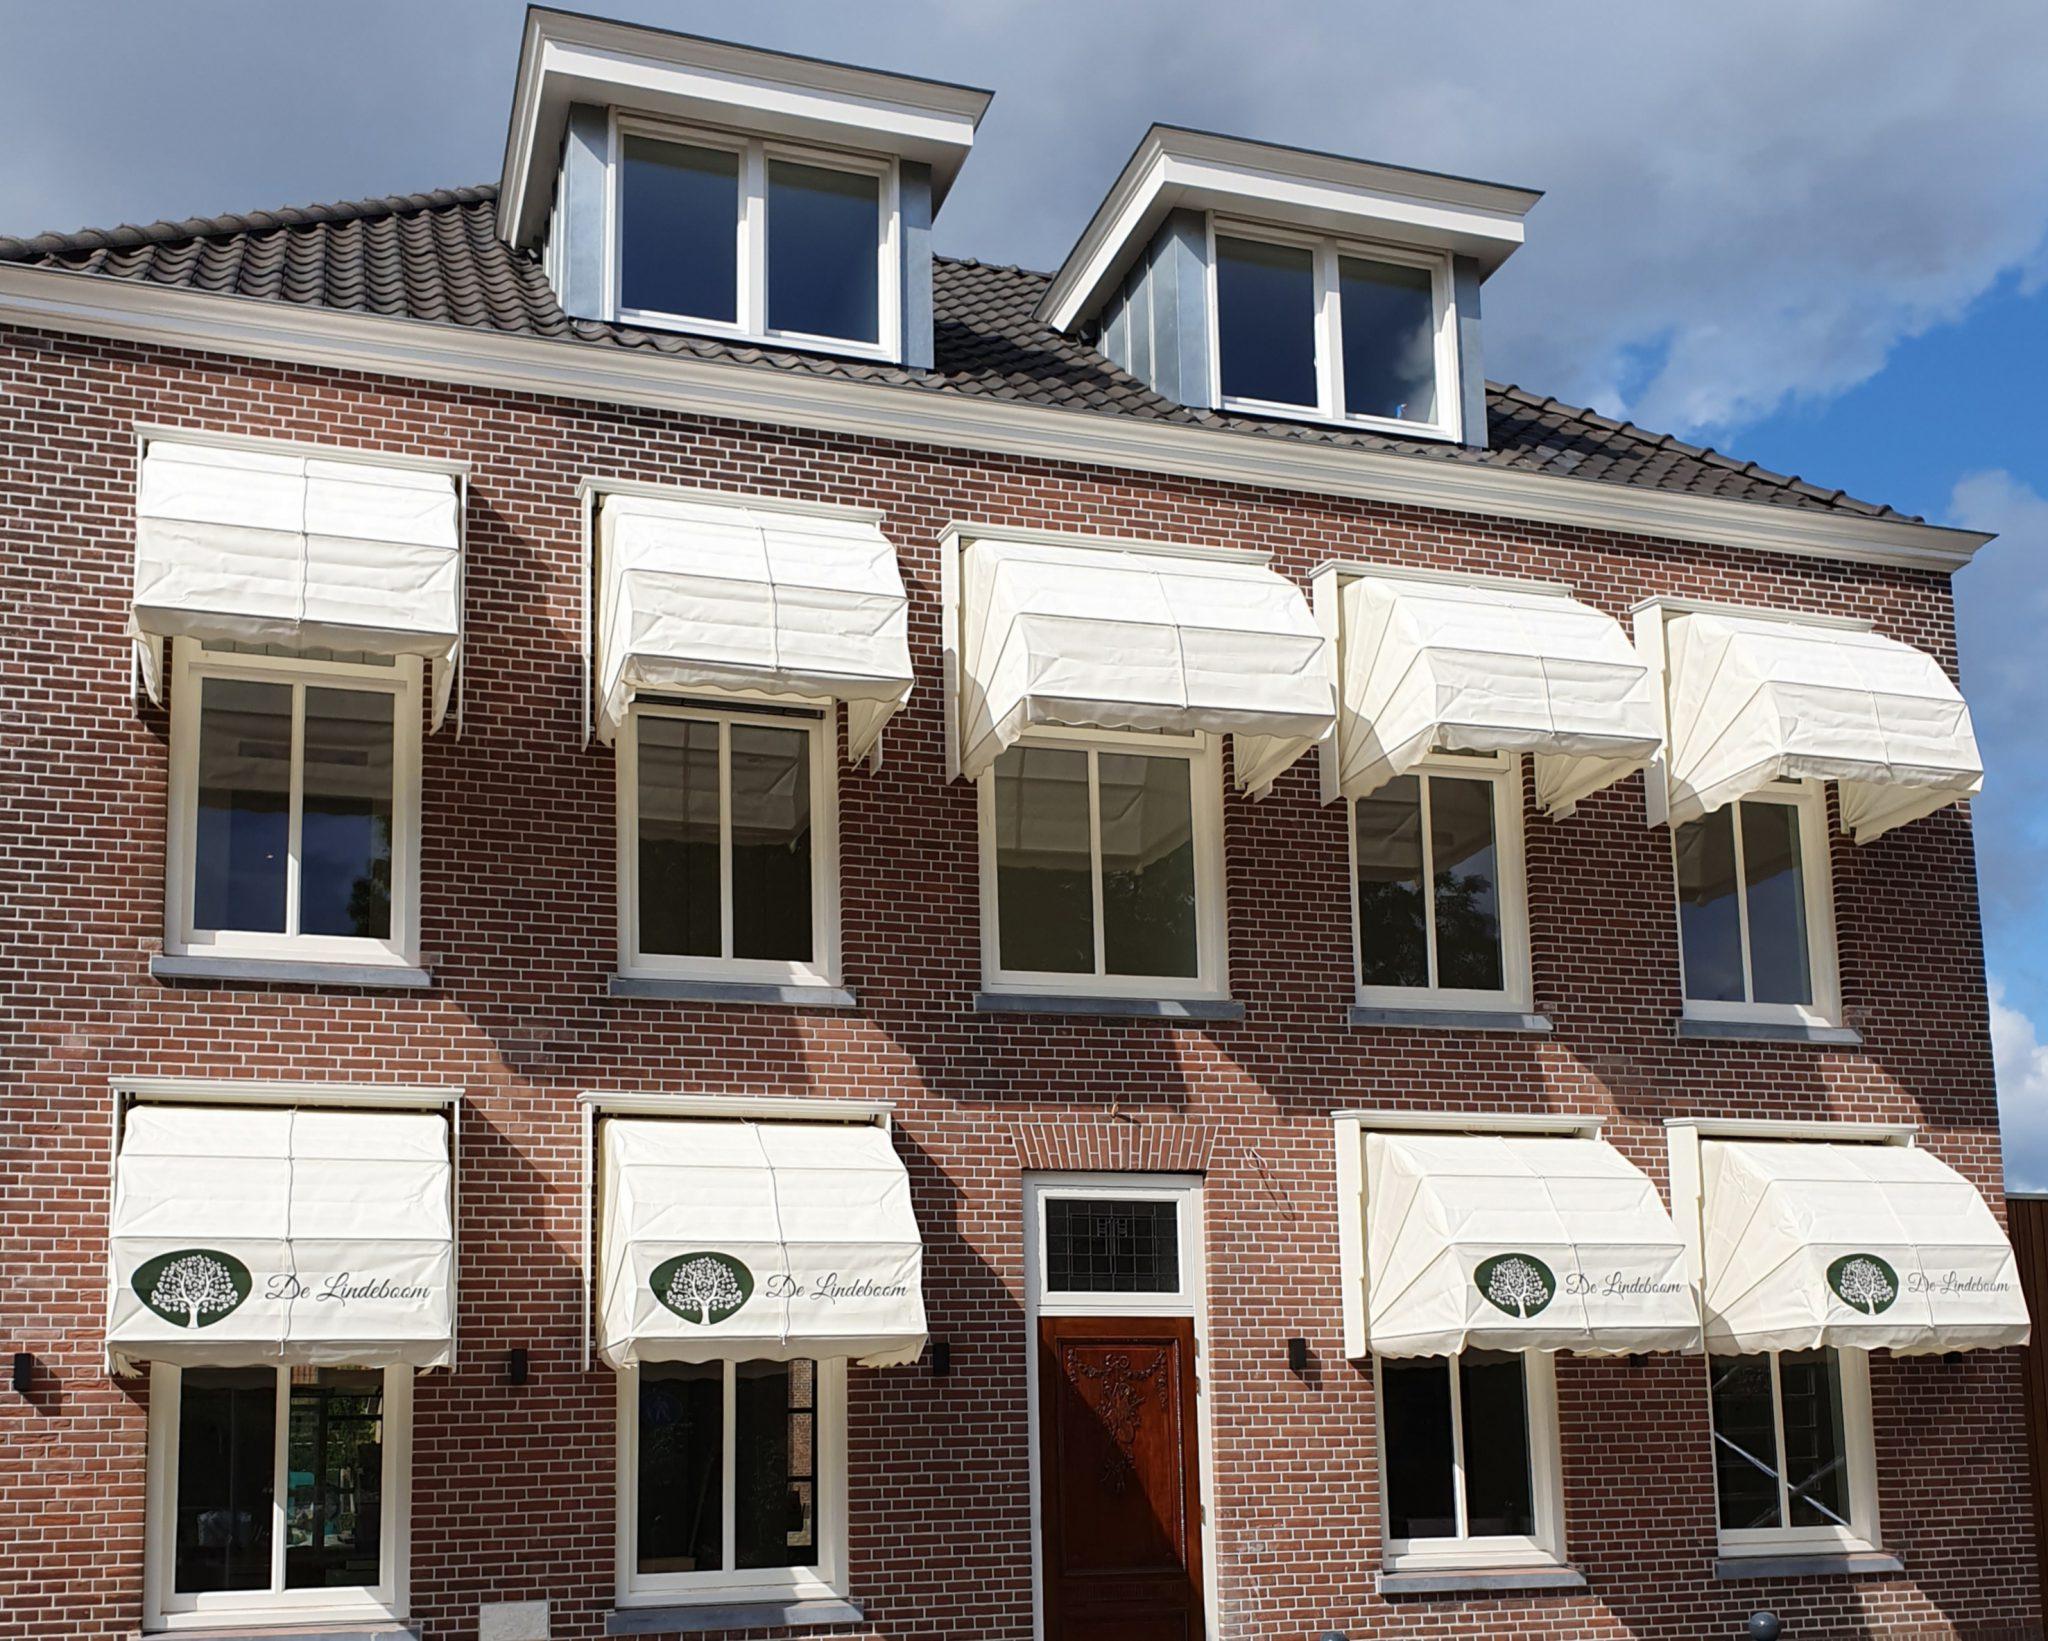 De Lindeboom Serooskerke Hotel Brasserie Restaurant